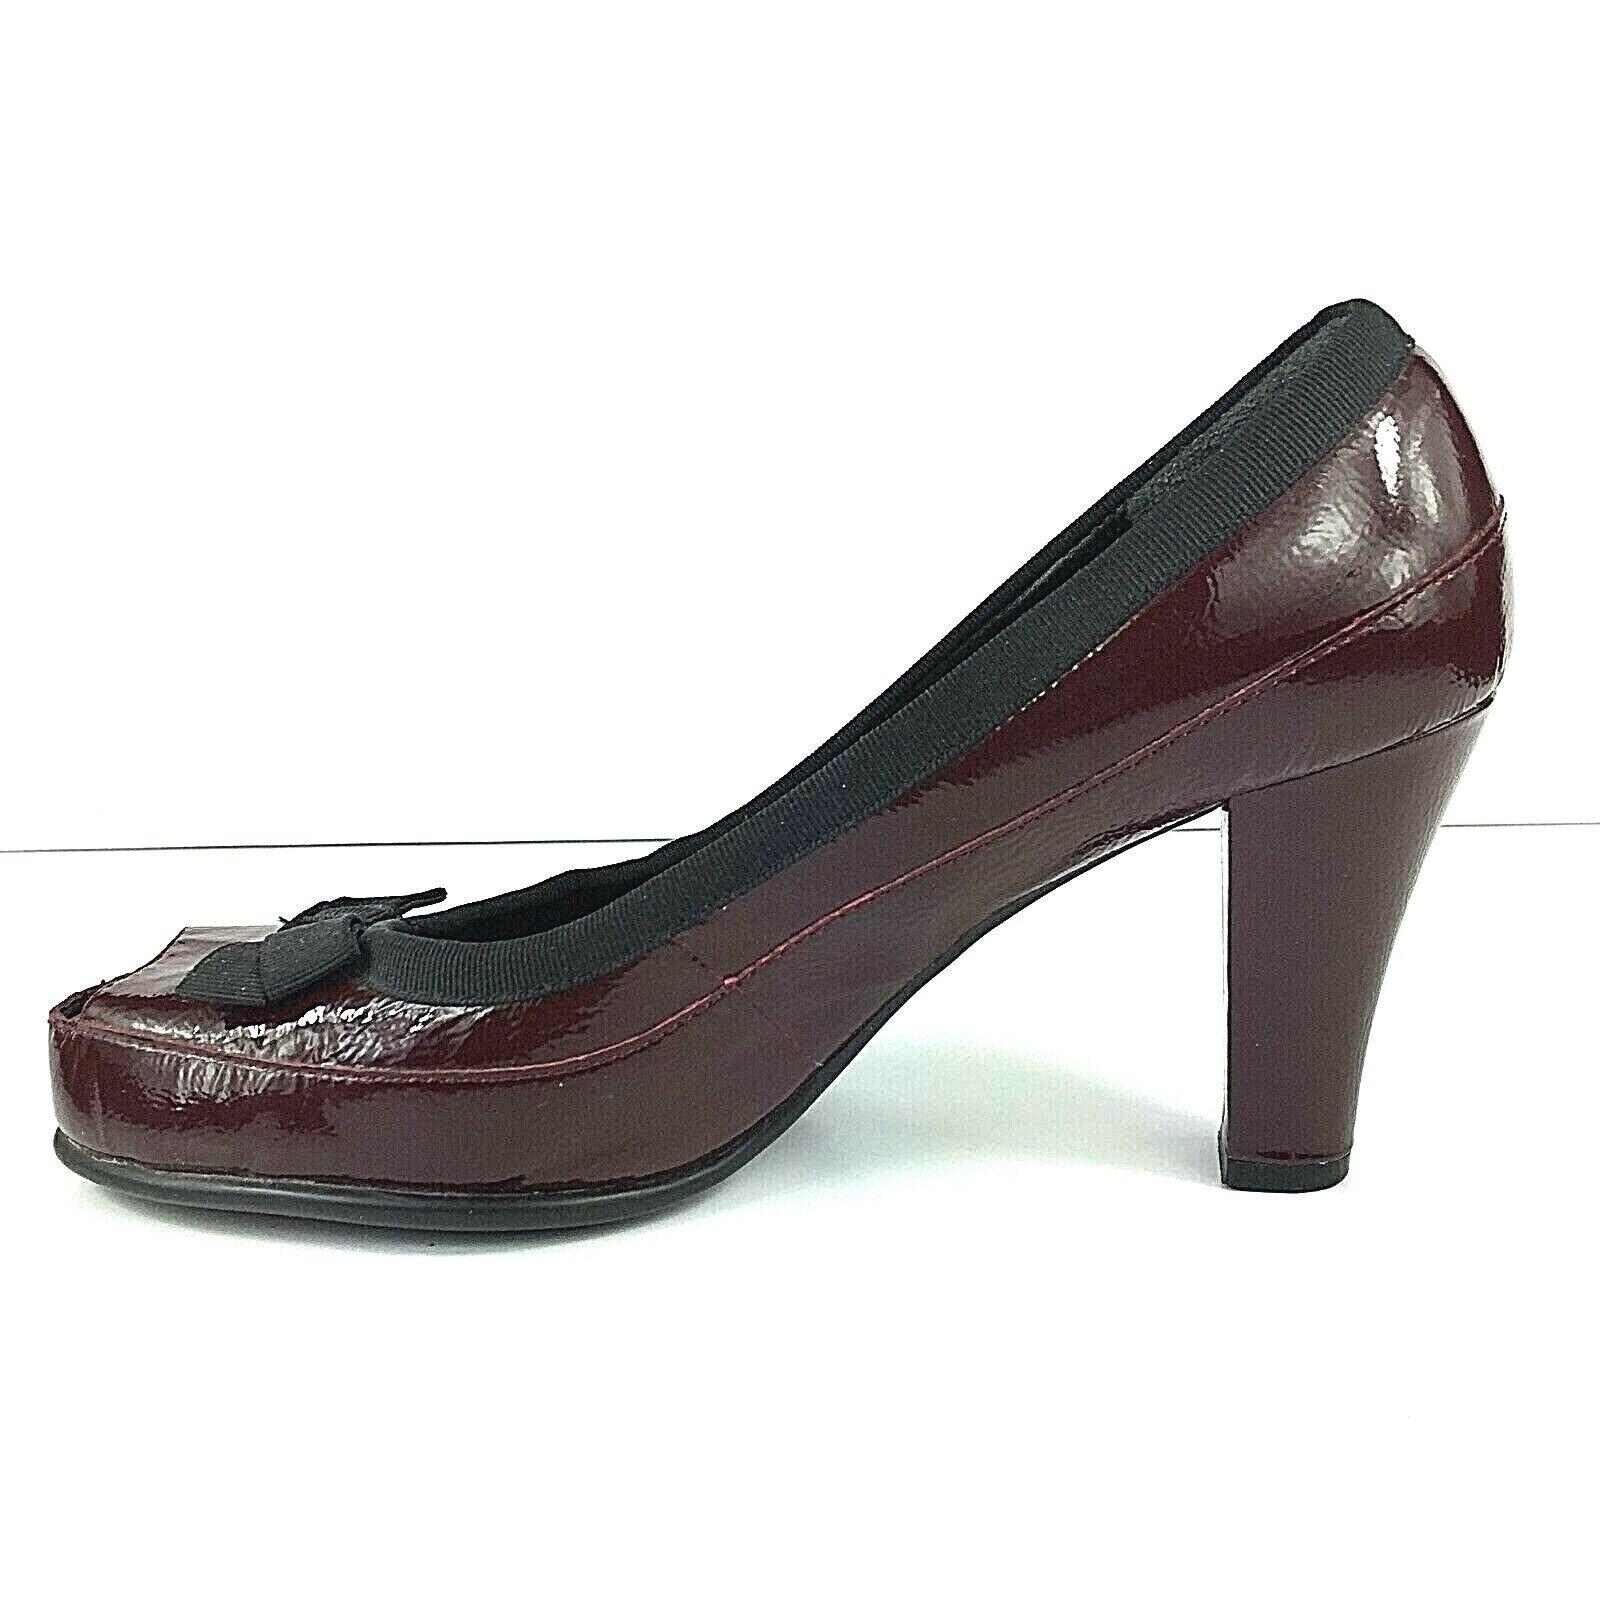 Aerosoles Benefit Leather Peep Toe Pumps Women's 8.5 Wine Burgundy Black Bow